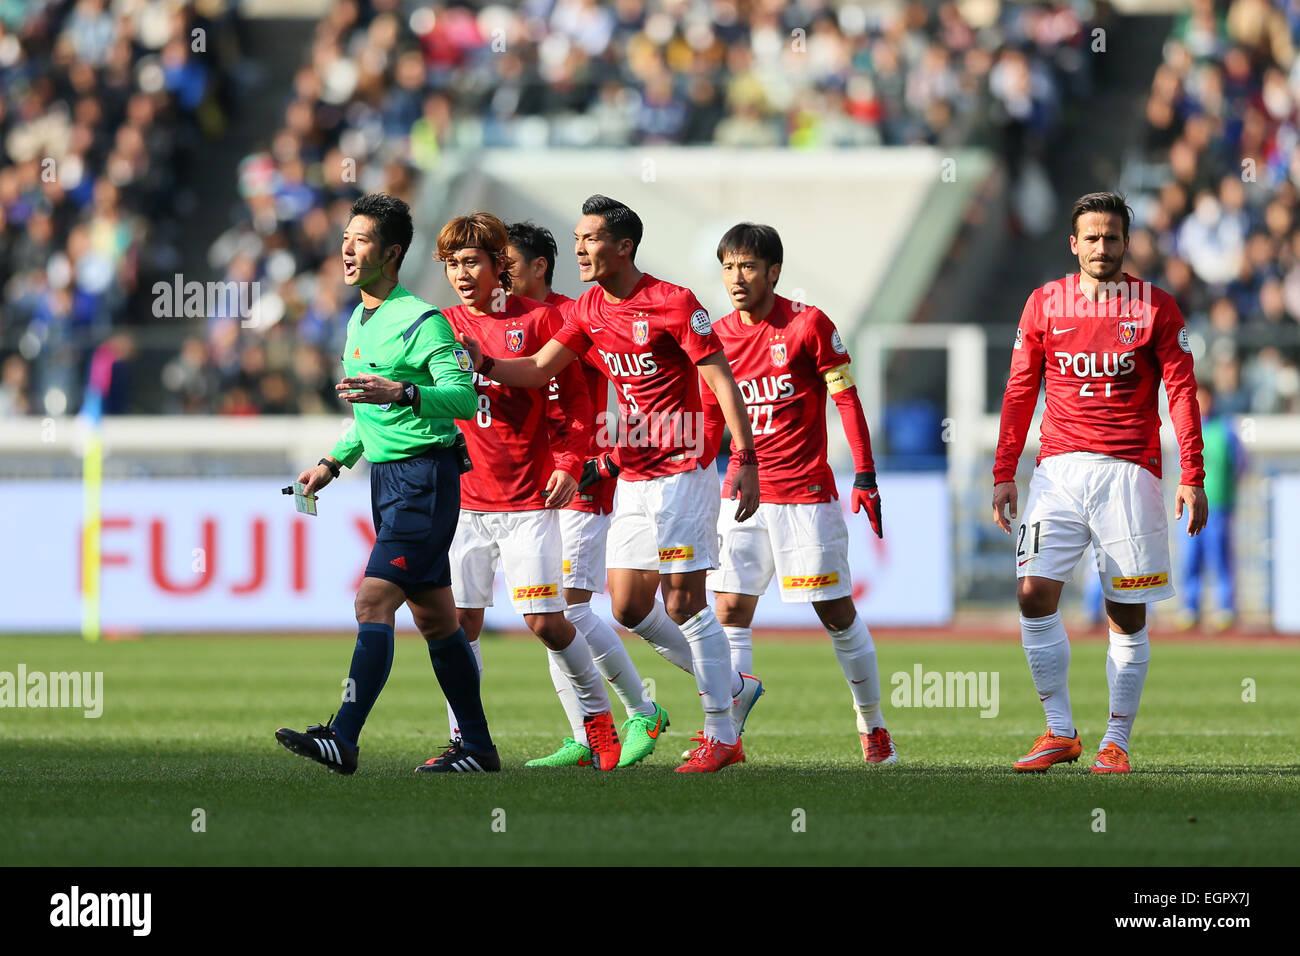 Kanagawa Japan 28th Feb 2015 Urawa Red Diamonds Team Group Reds Stock Photo Alamy